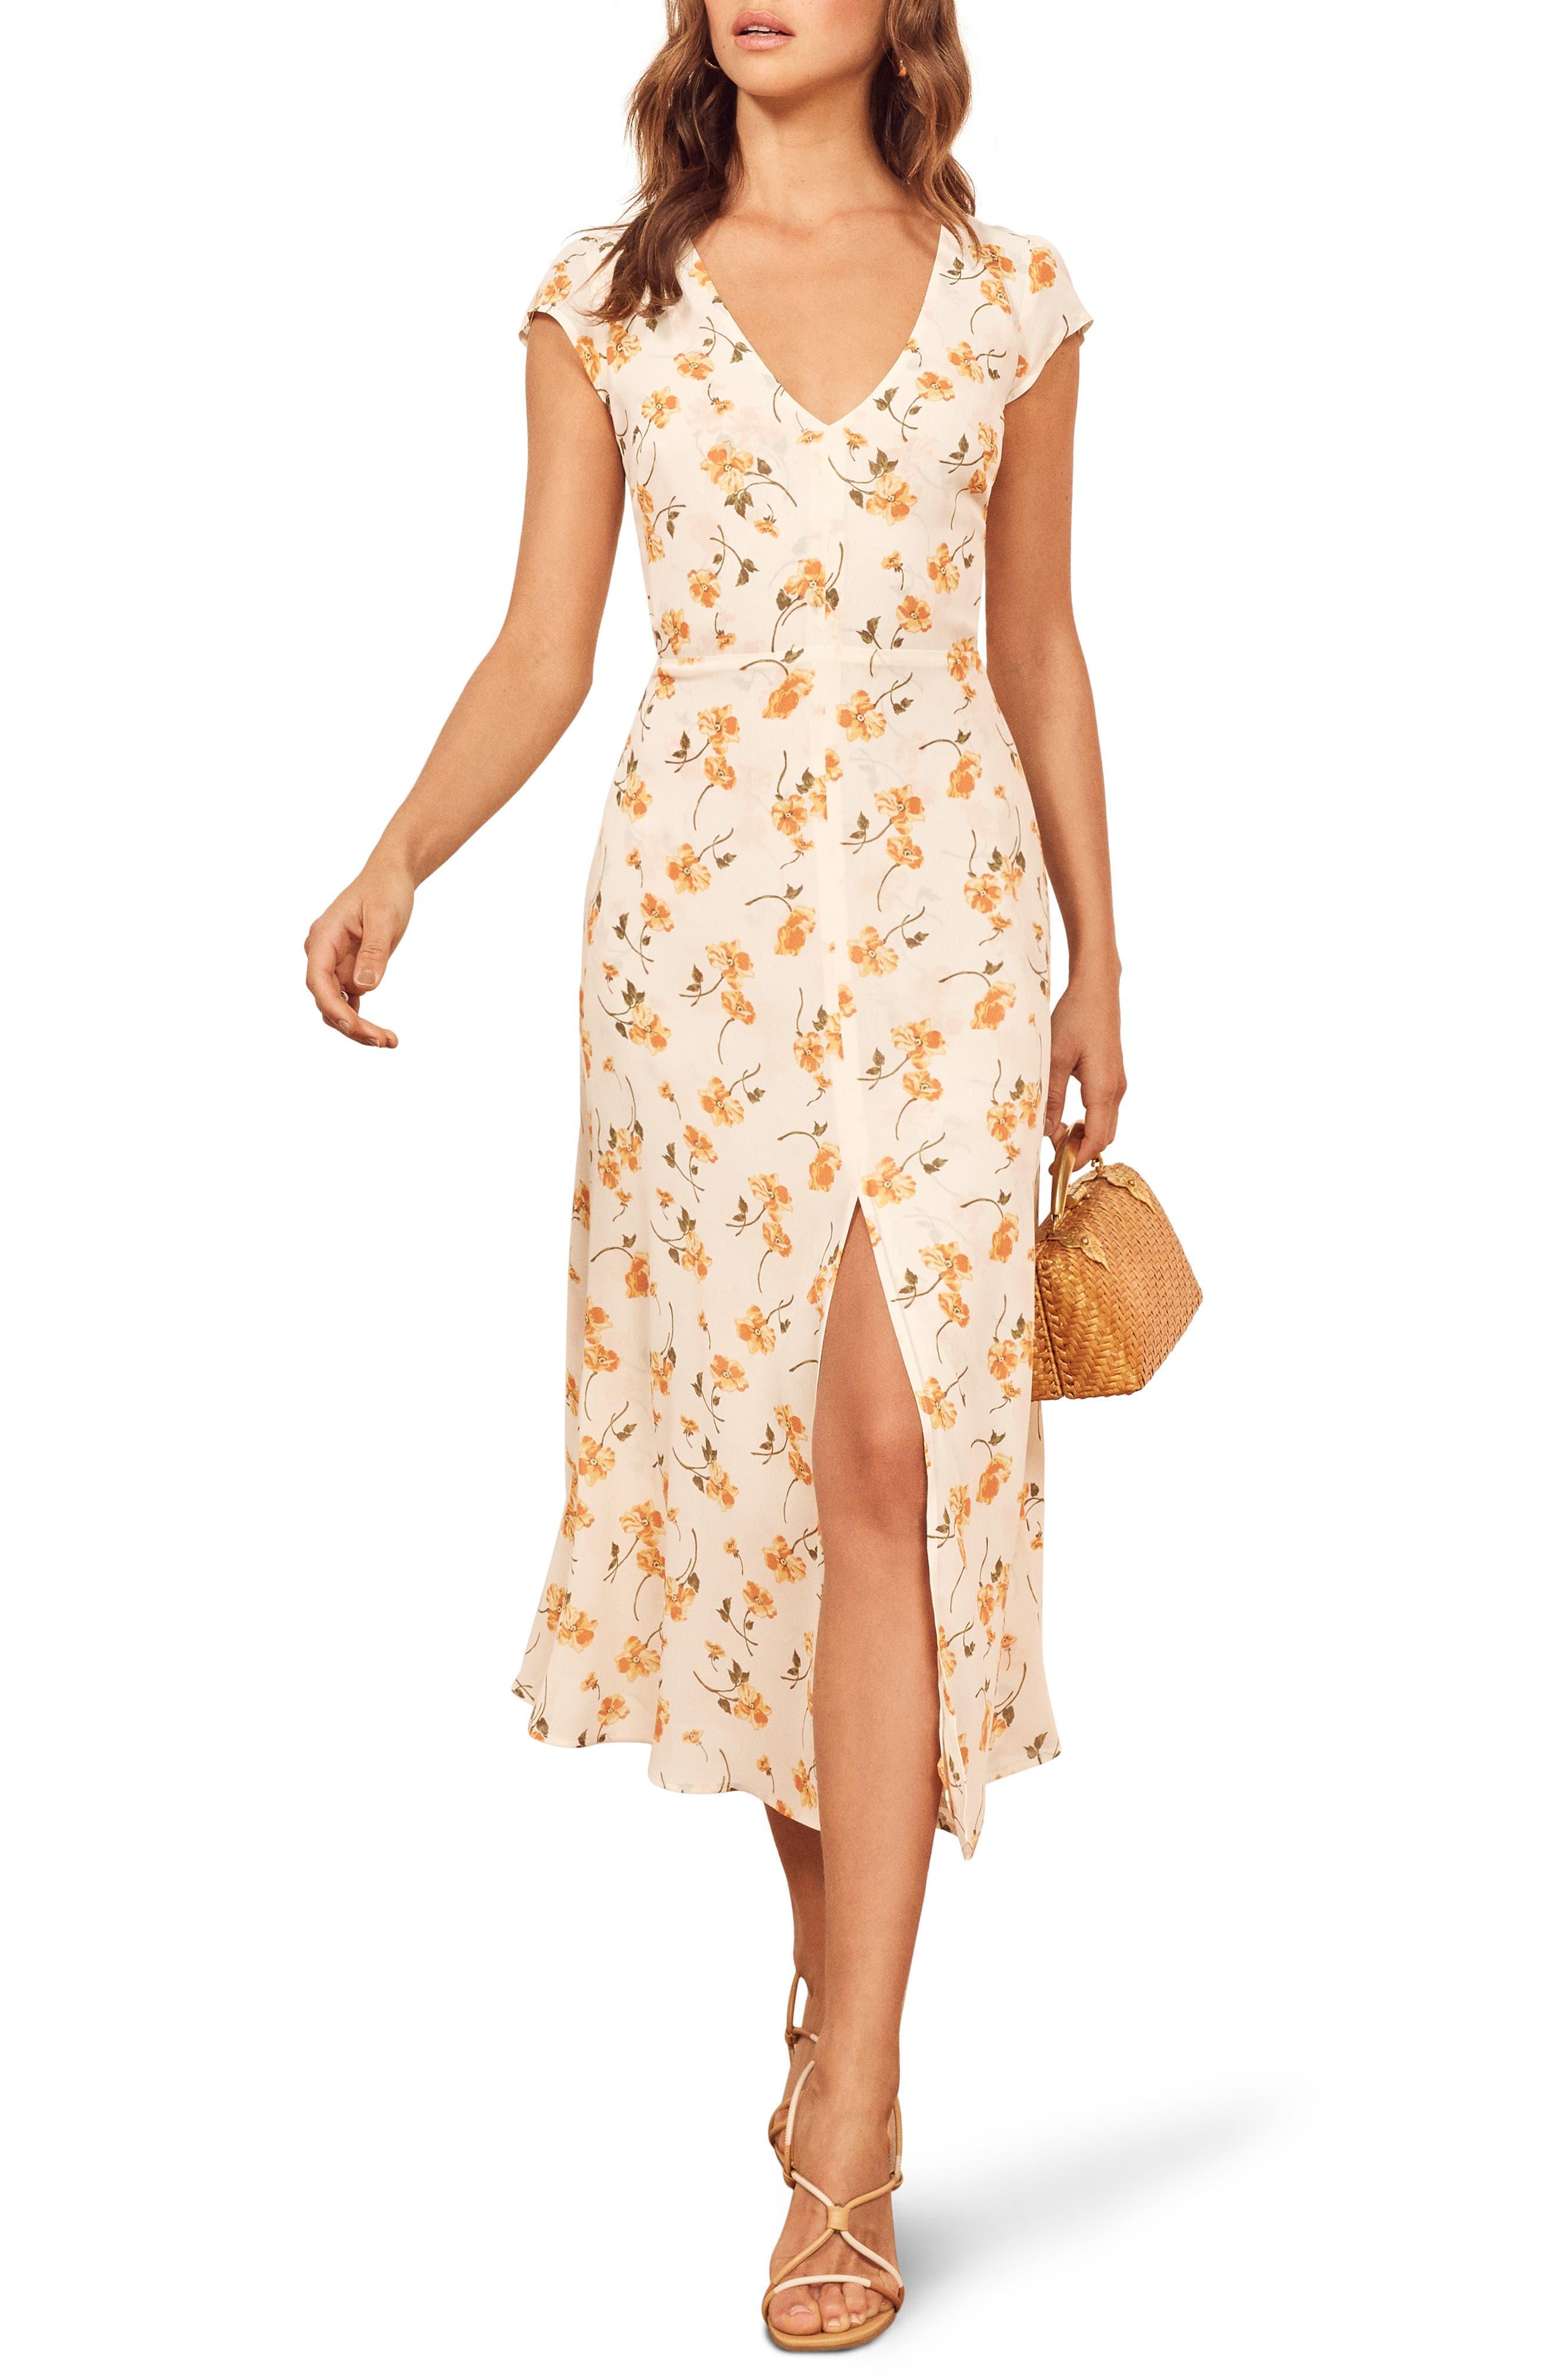 Reformation Floral Wellfleet Back Cutout Dress, White